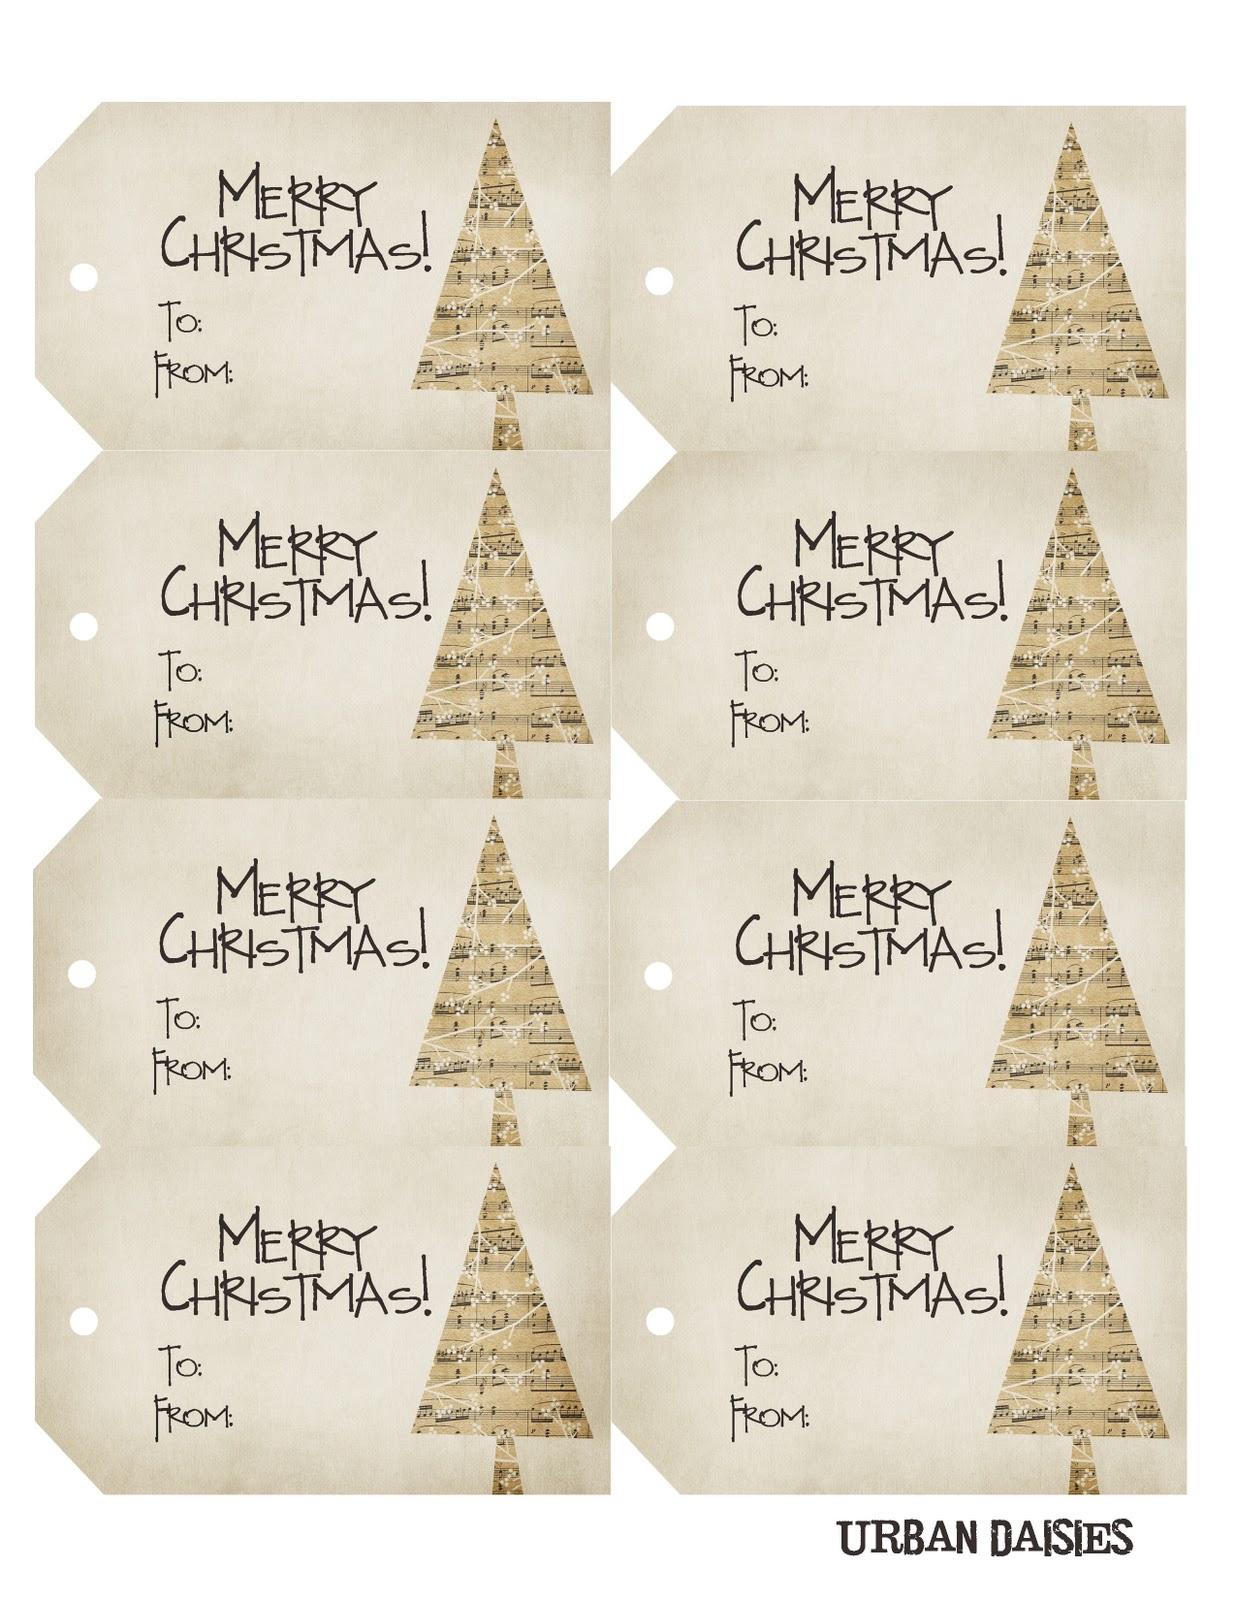 Urban Daisies: Christmas Gift Tags